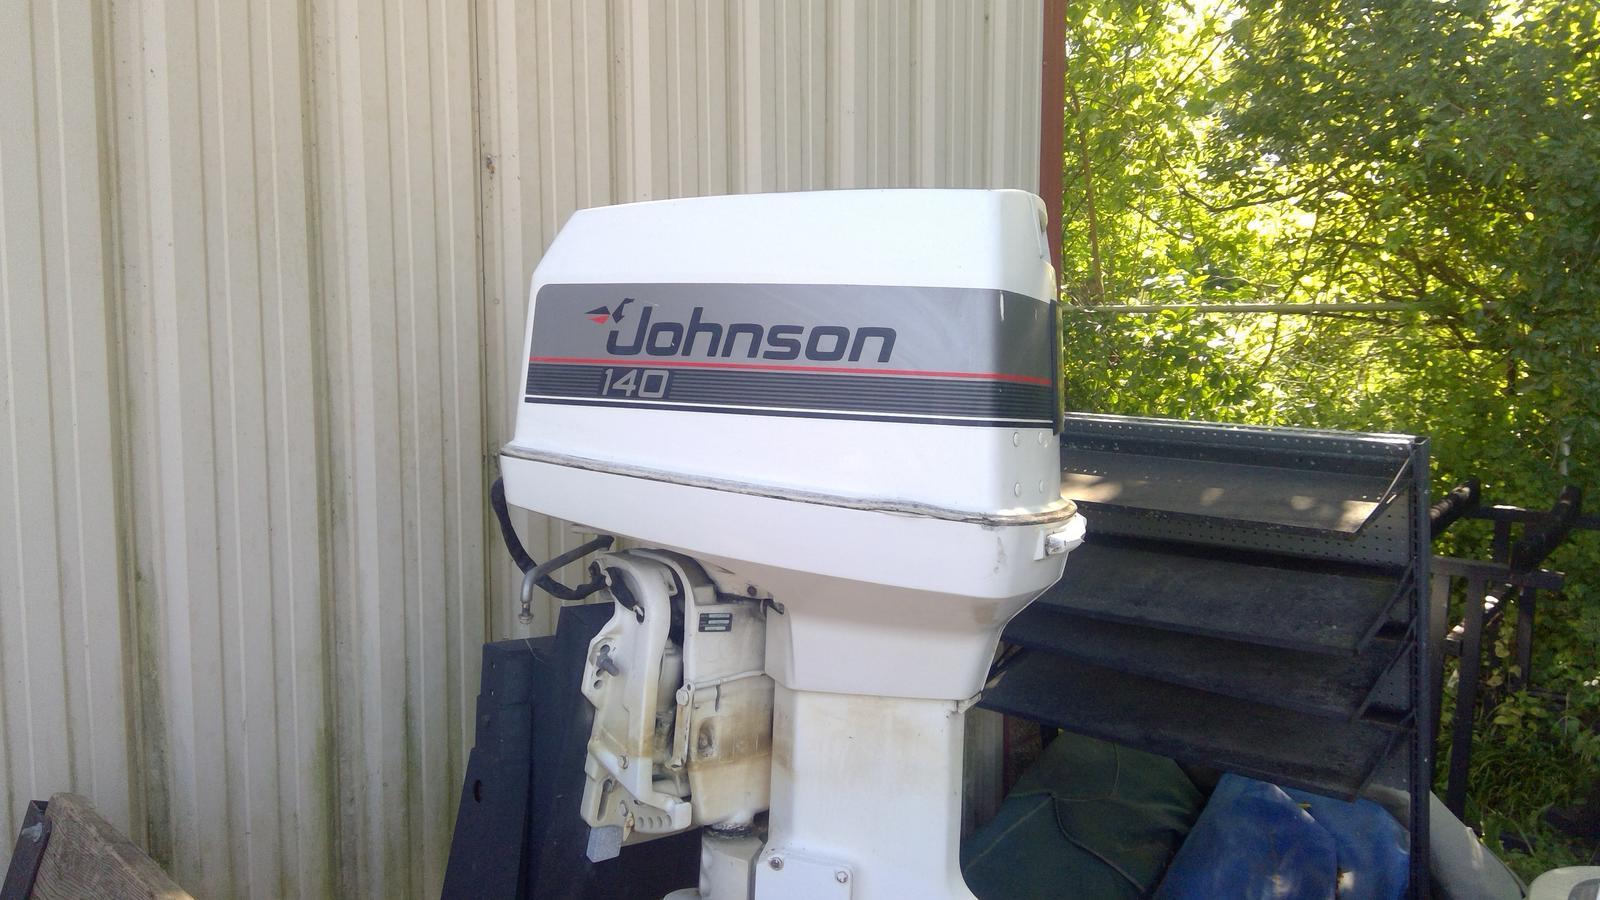 Inventory from Johnson and Ebbtide Quam's Marine & Motor